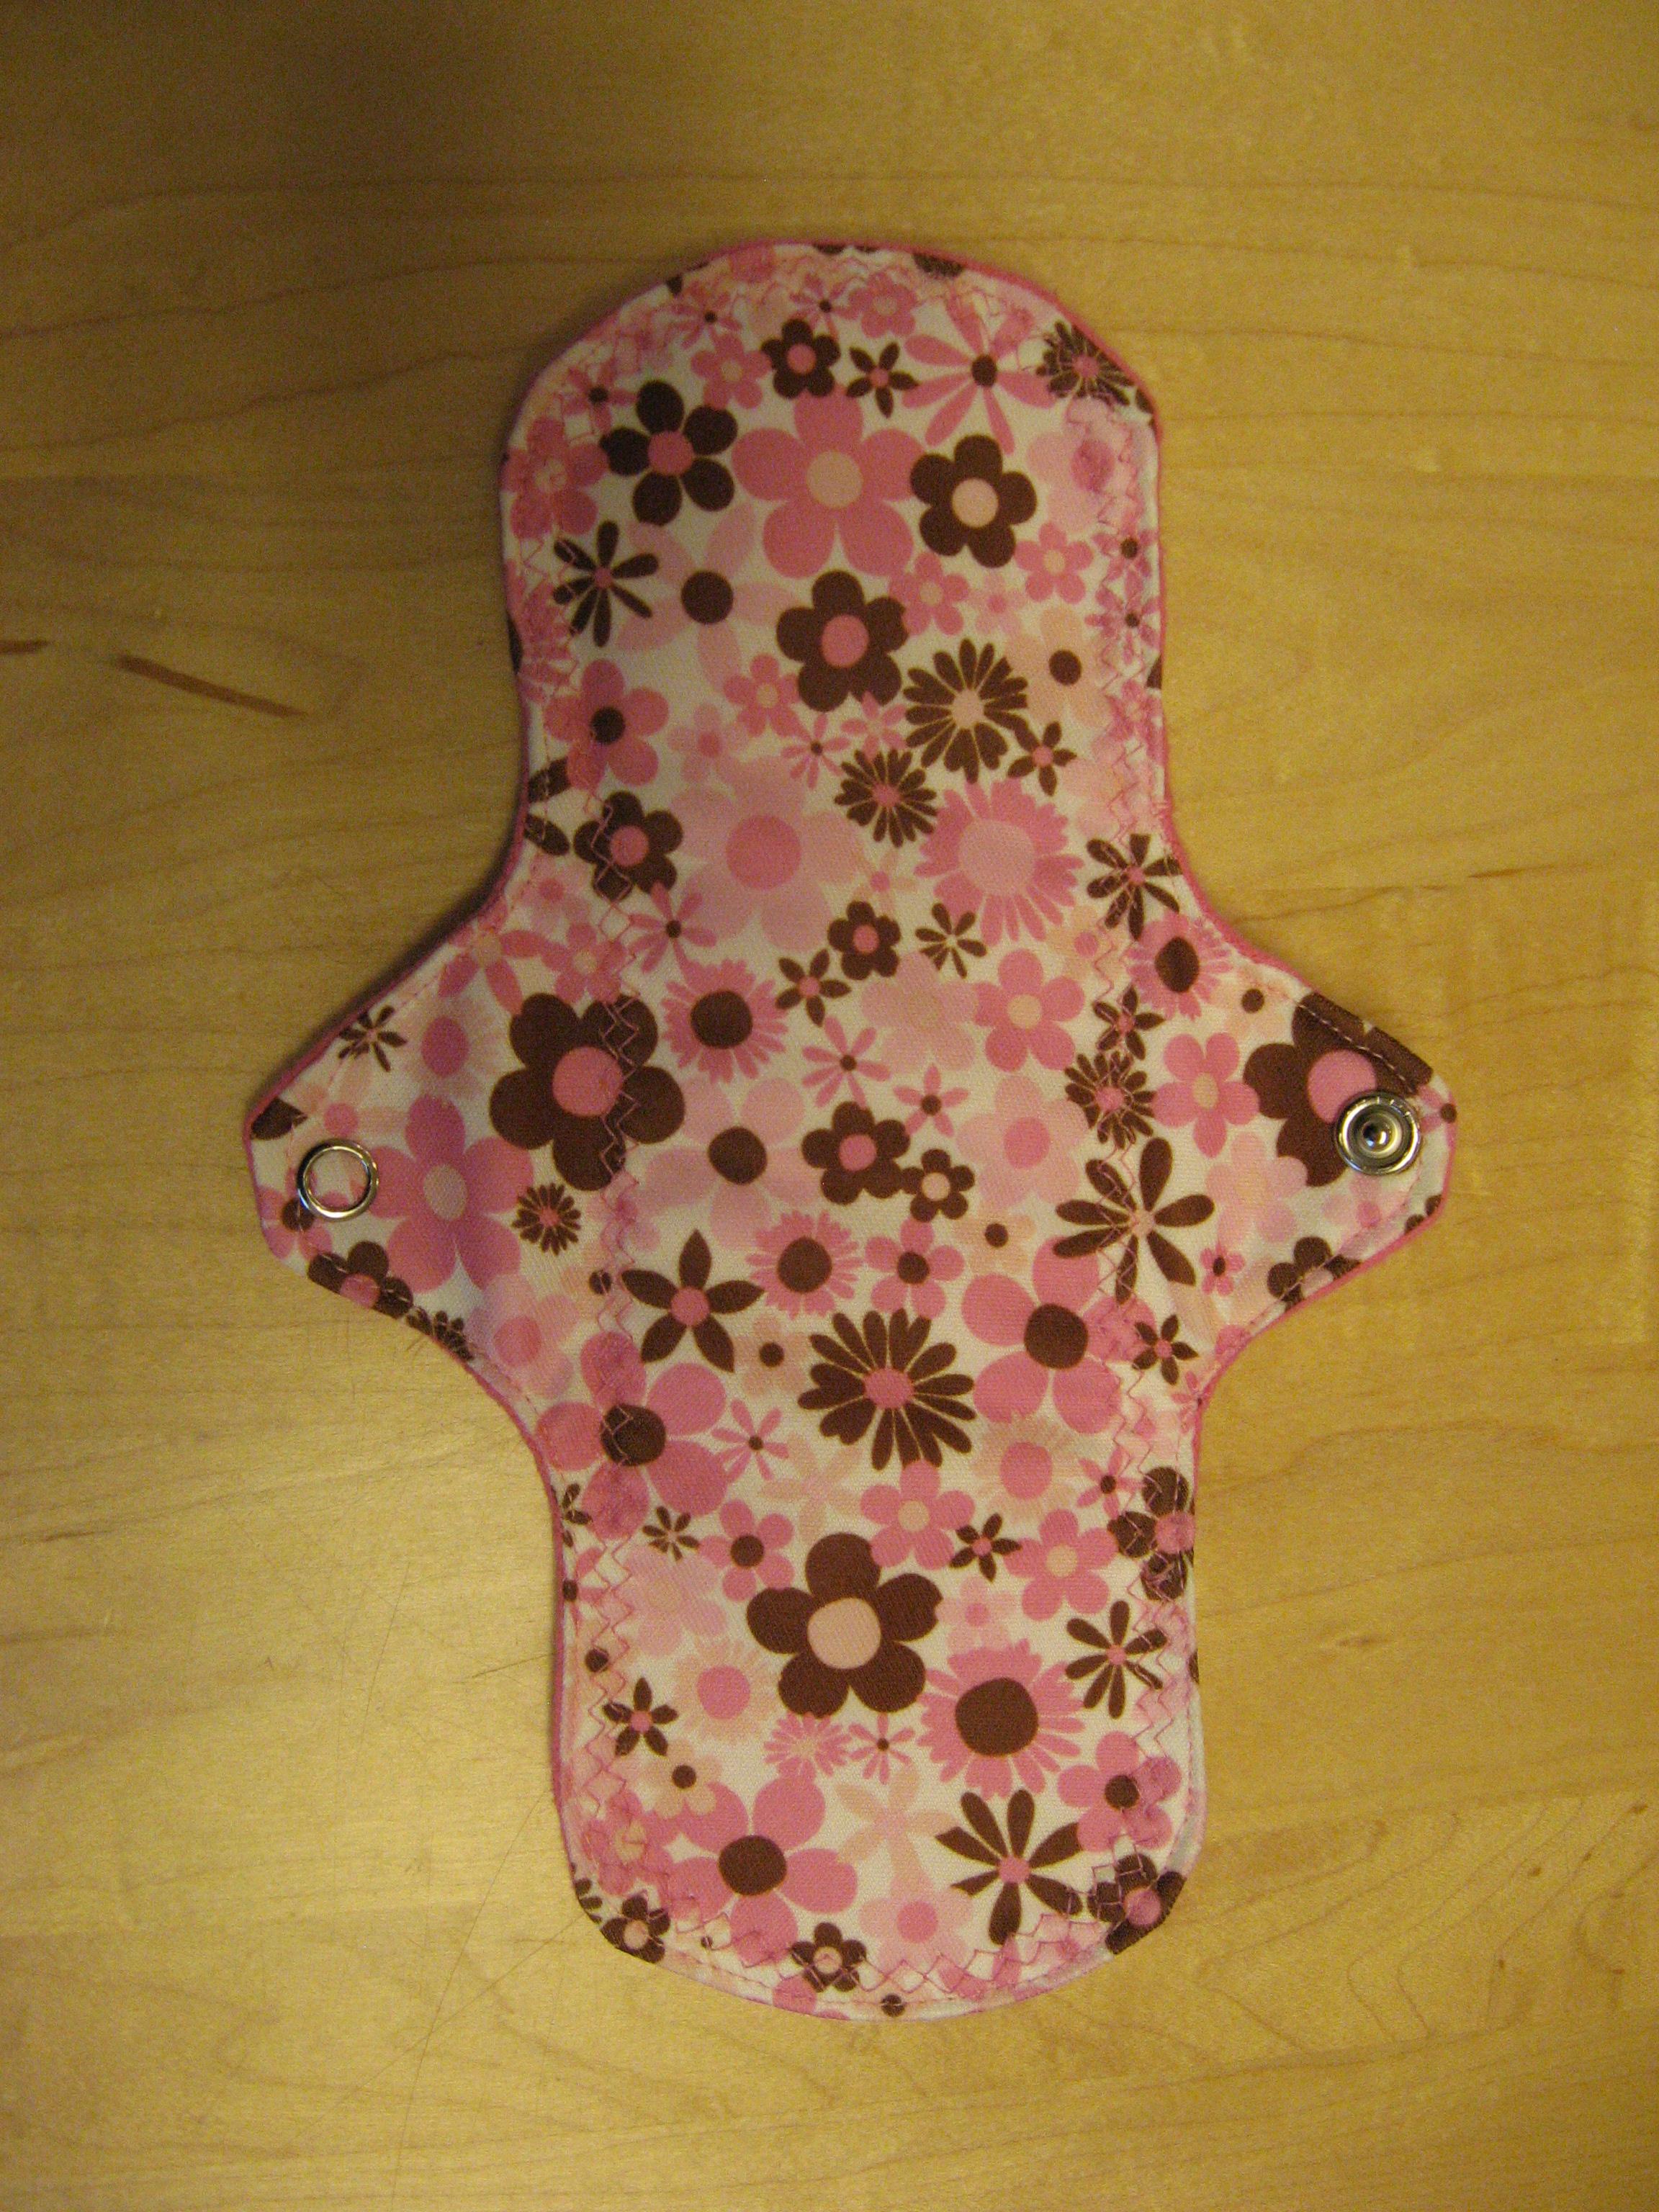 askpaulinecom free cloth menstrual pad pattern tutorial